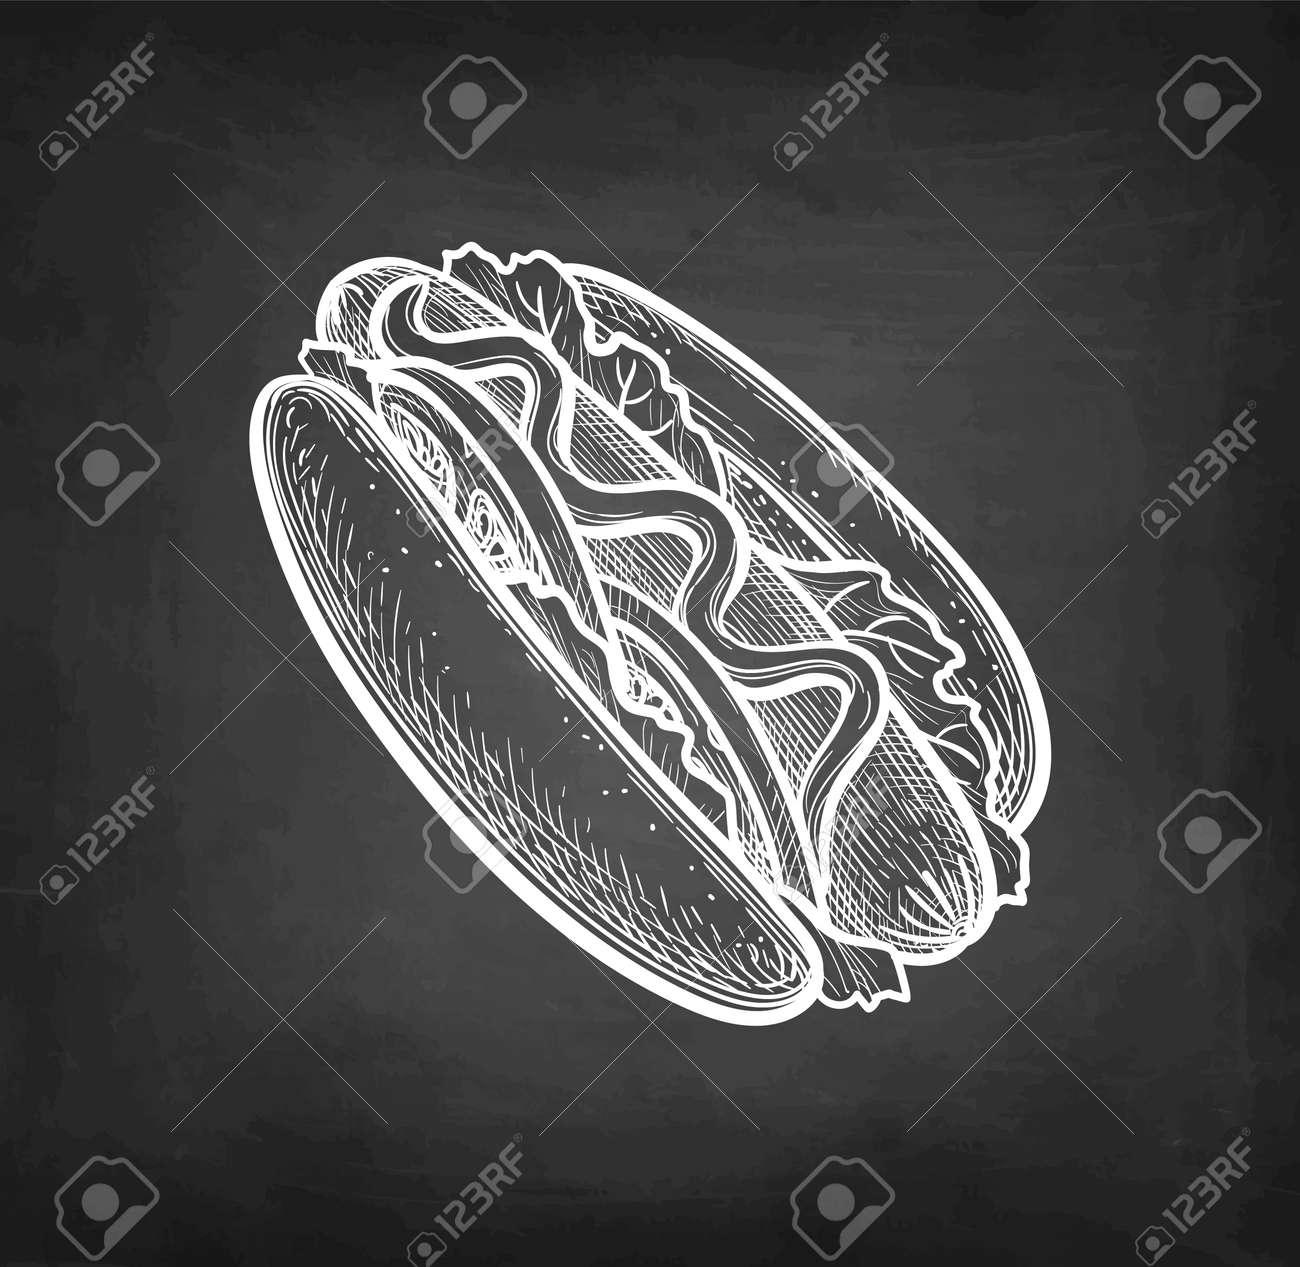 Chalk sketch of hot dog. - 169815930